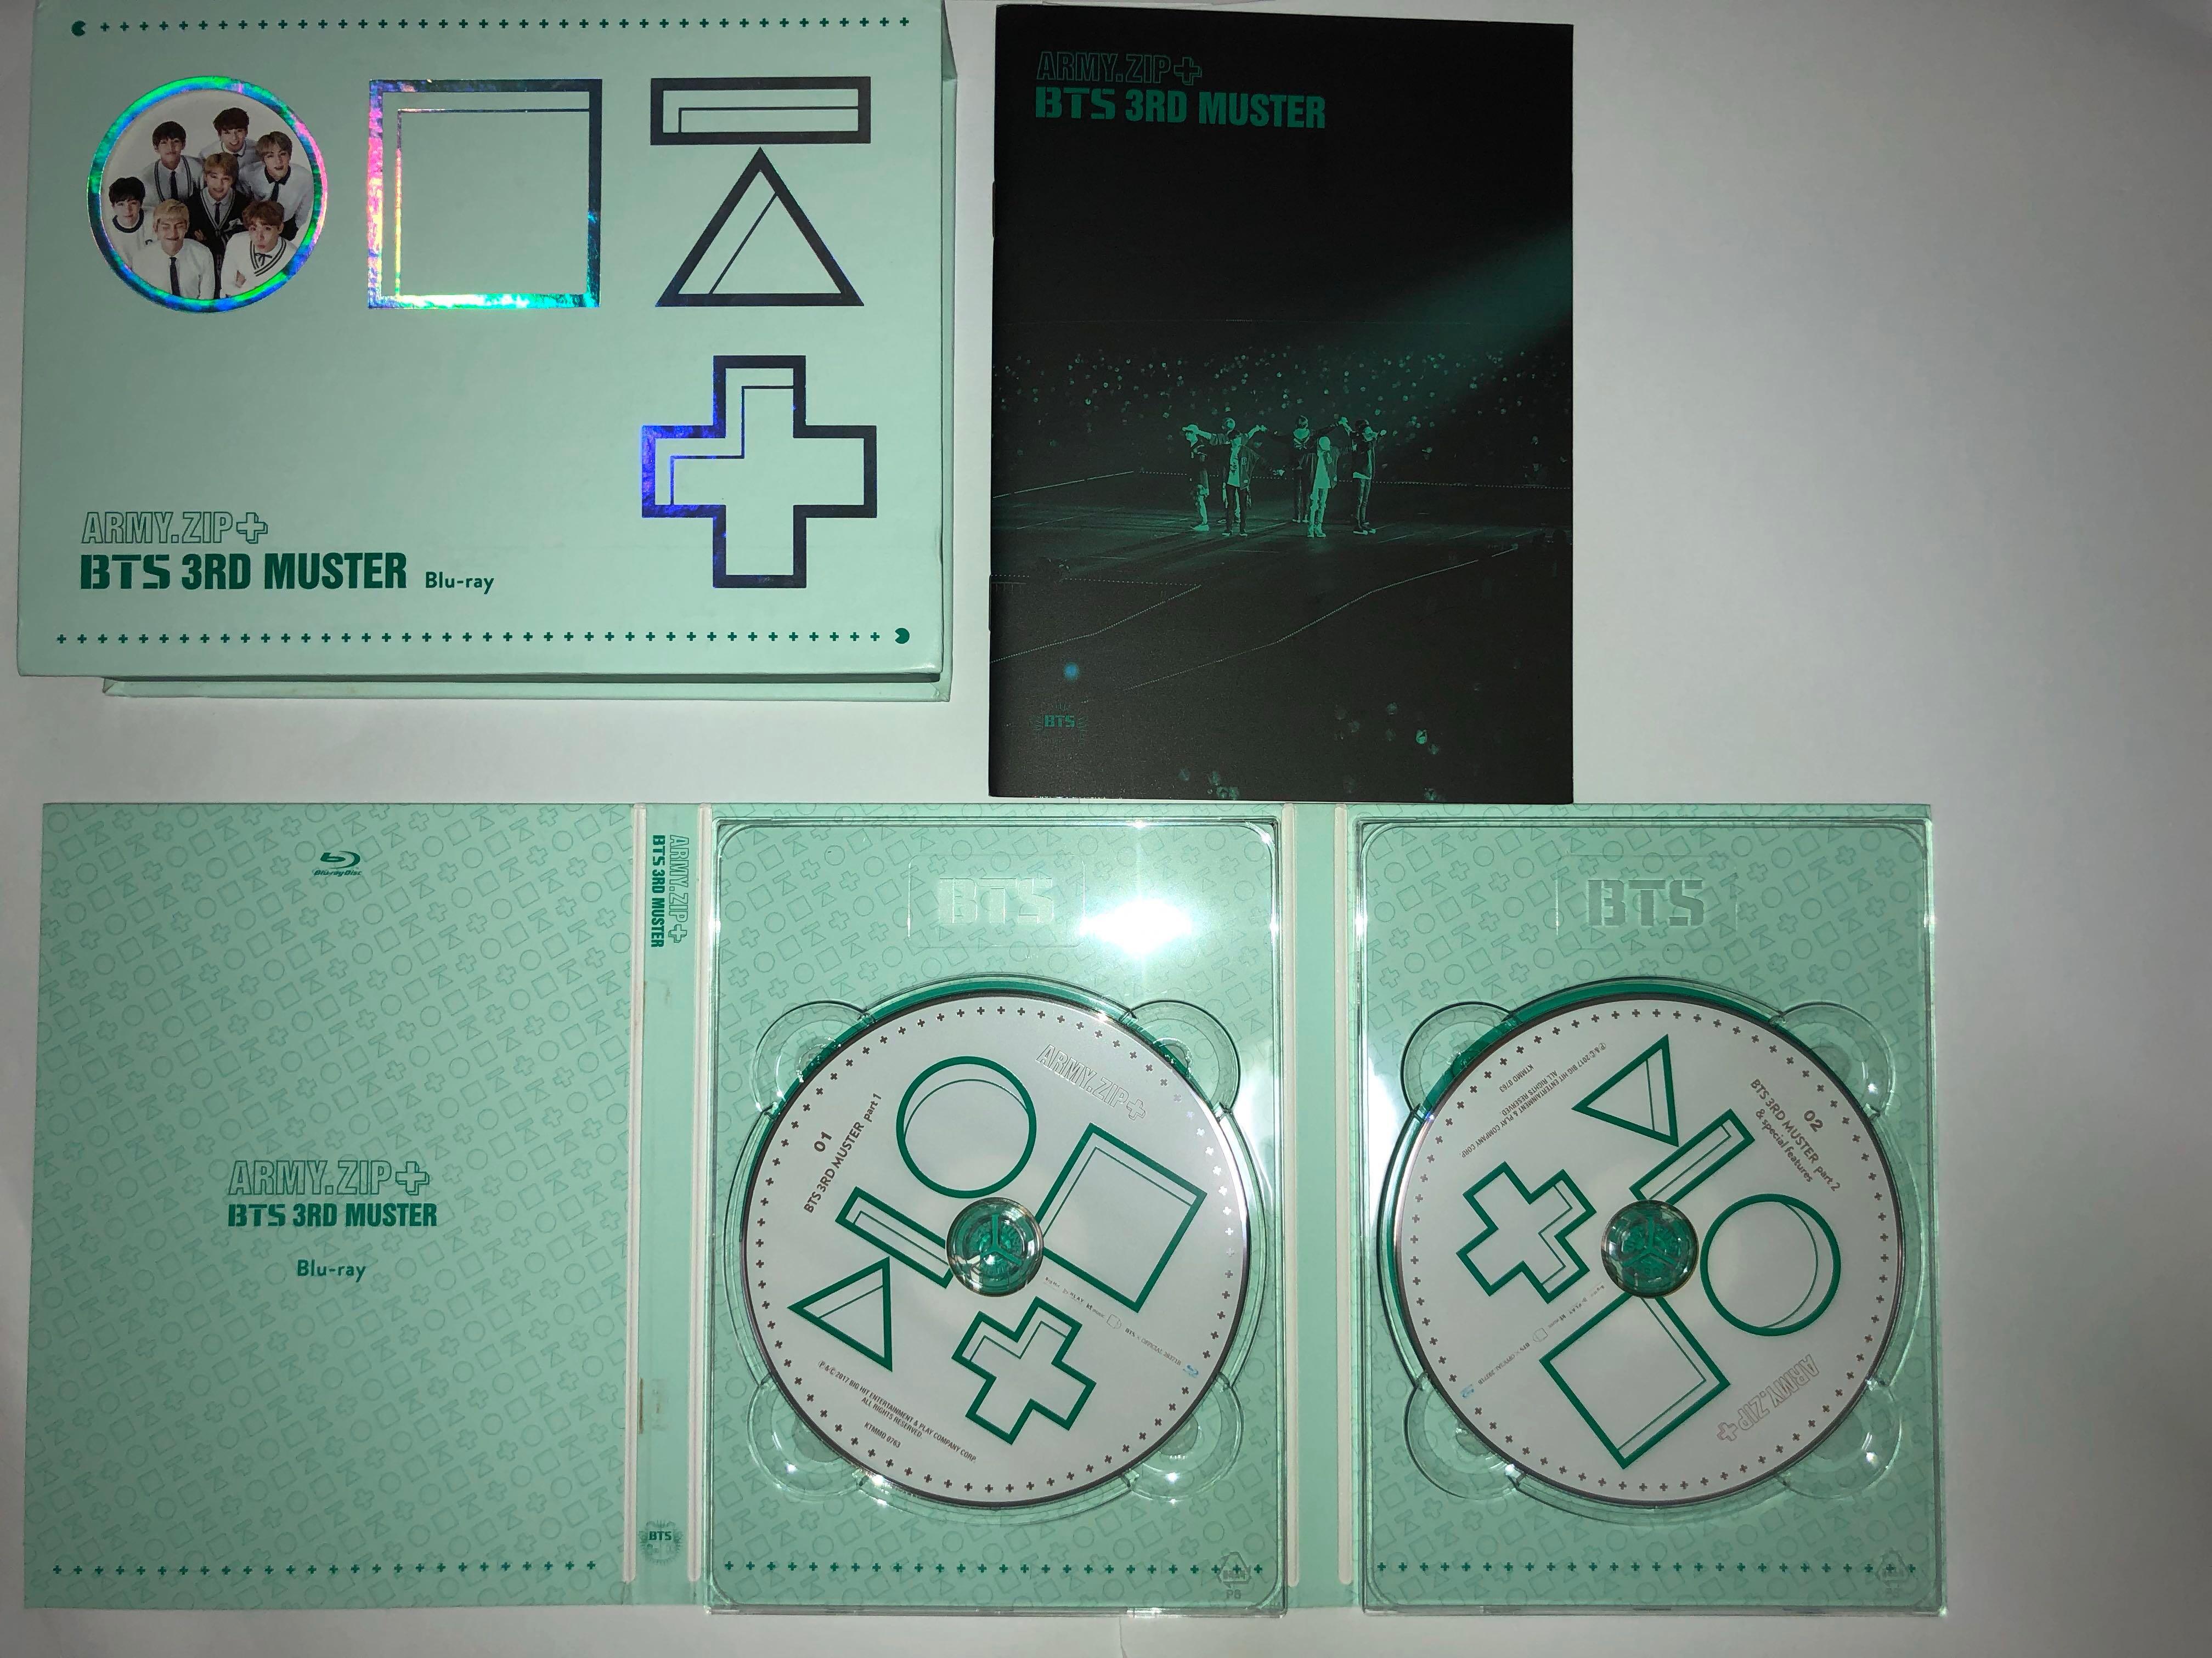 [URGENT WTS] BTS 3RD MUSTER DVD BLU-RAY